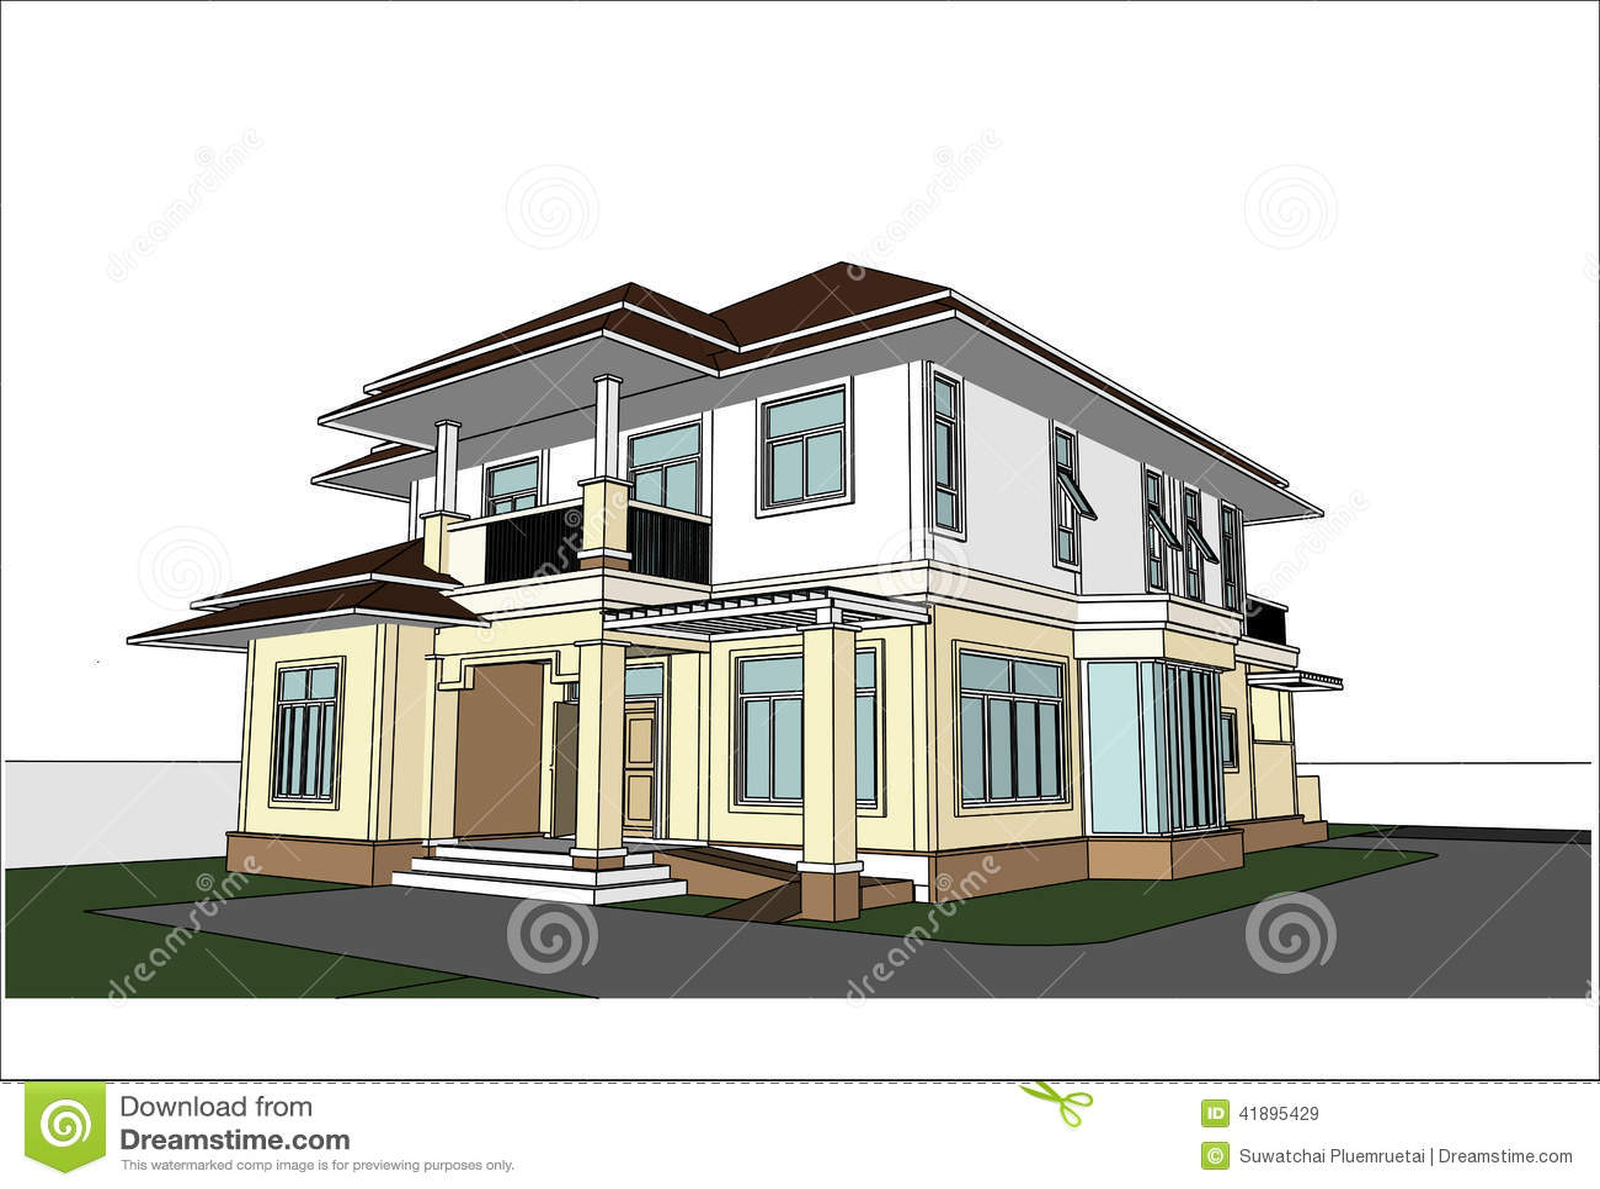 Sketch Design Of House Vector Stock Vector Image 41895429